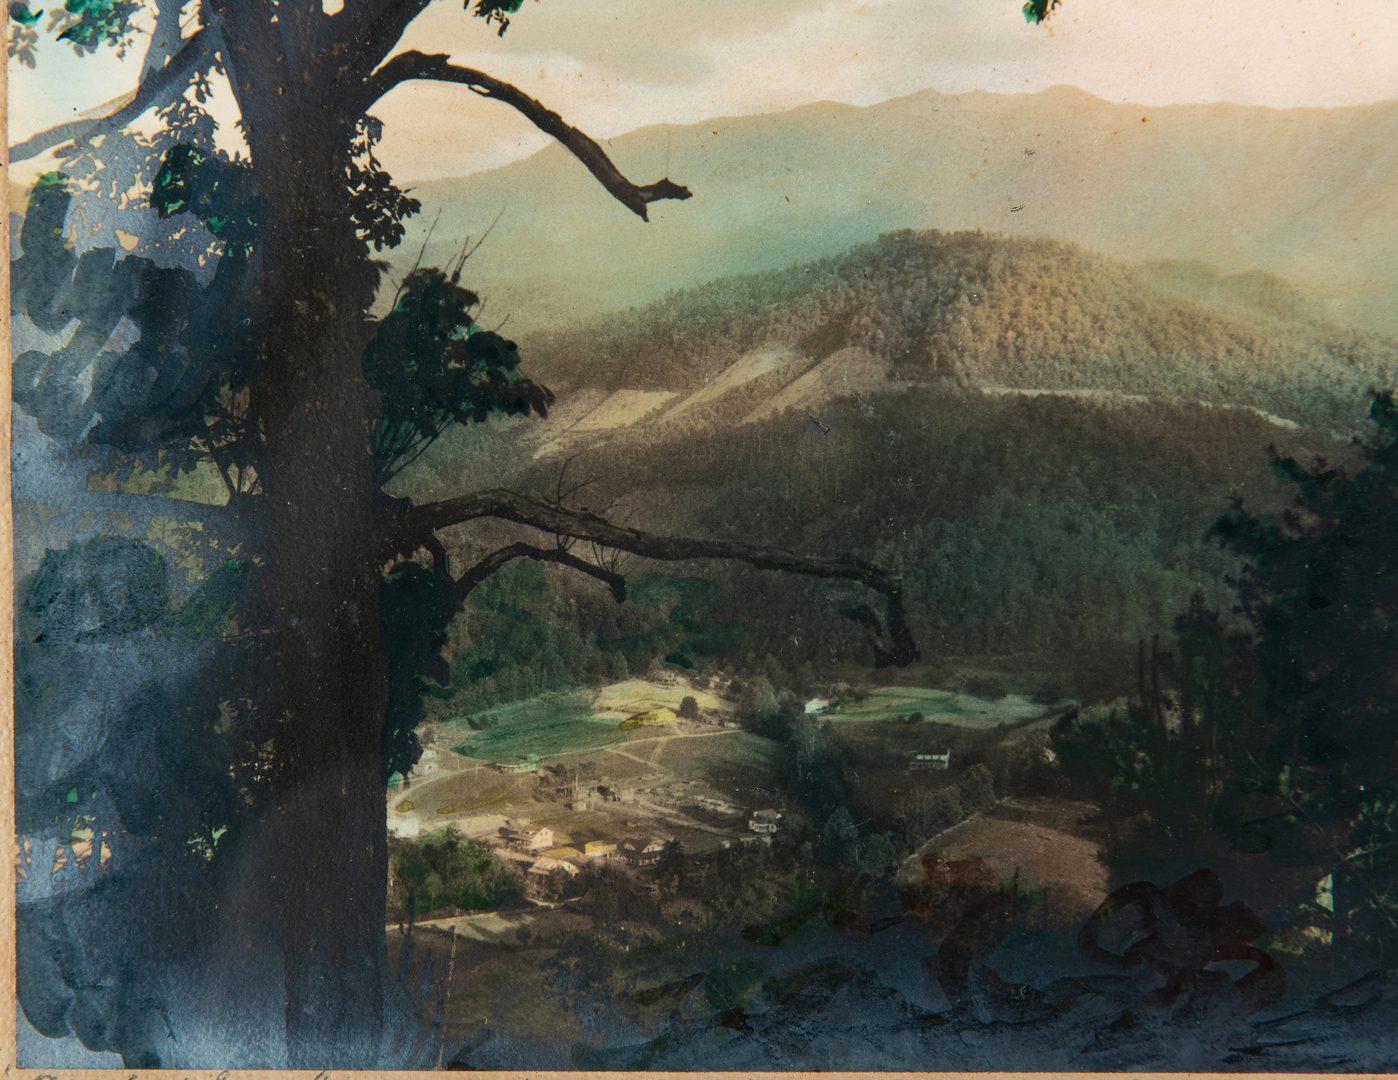 Lot 93: Jim Gray TN Watercolor & Knaffel/Thompson Mt. LeConte Photo, 2 items